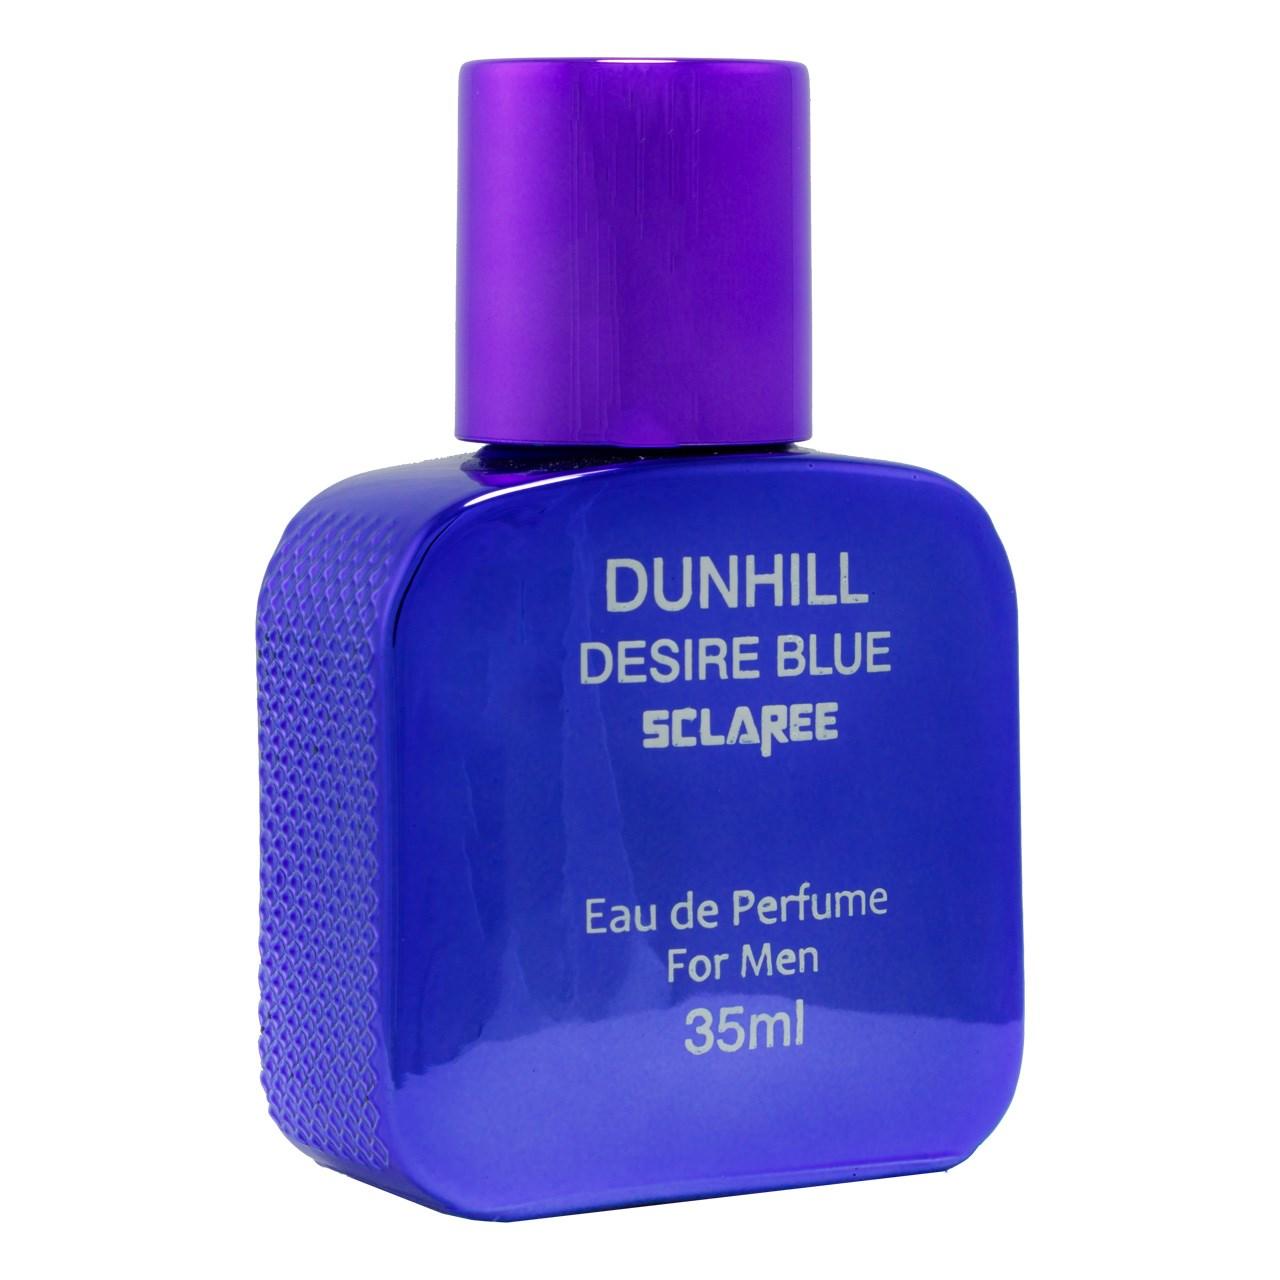 ادو پرفیوم مردانه اسکلاره مدل Dunhill Desire Blue حجم 35 میلی لیتر